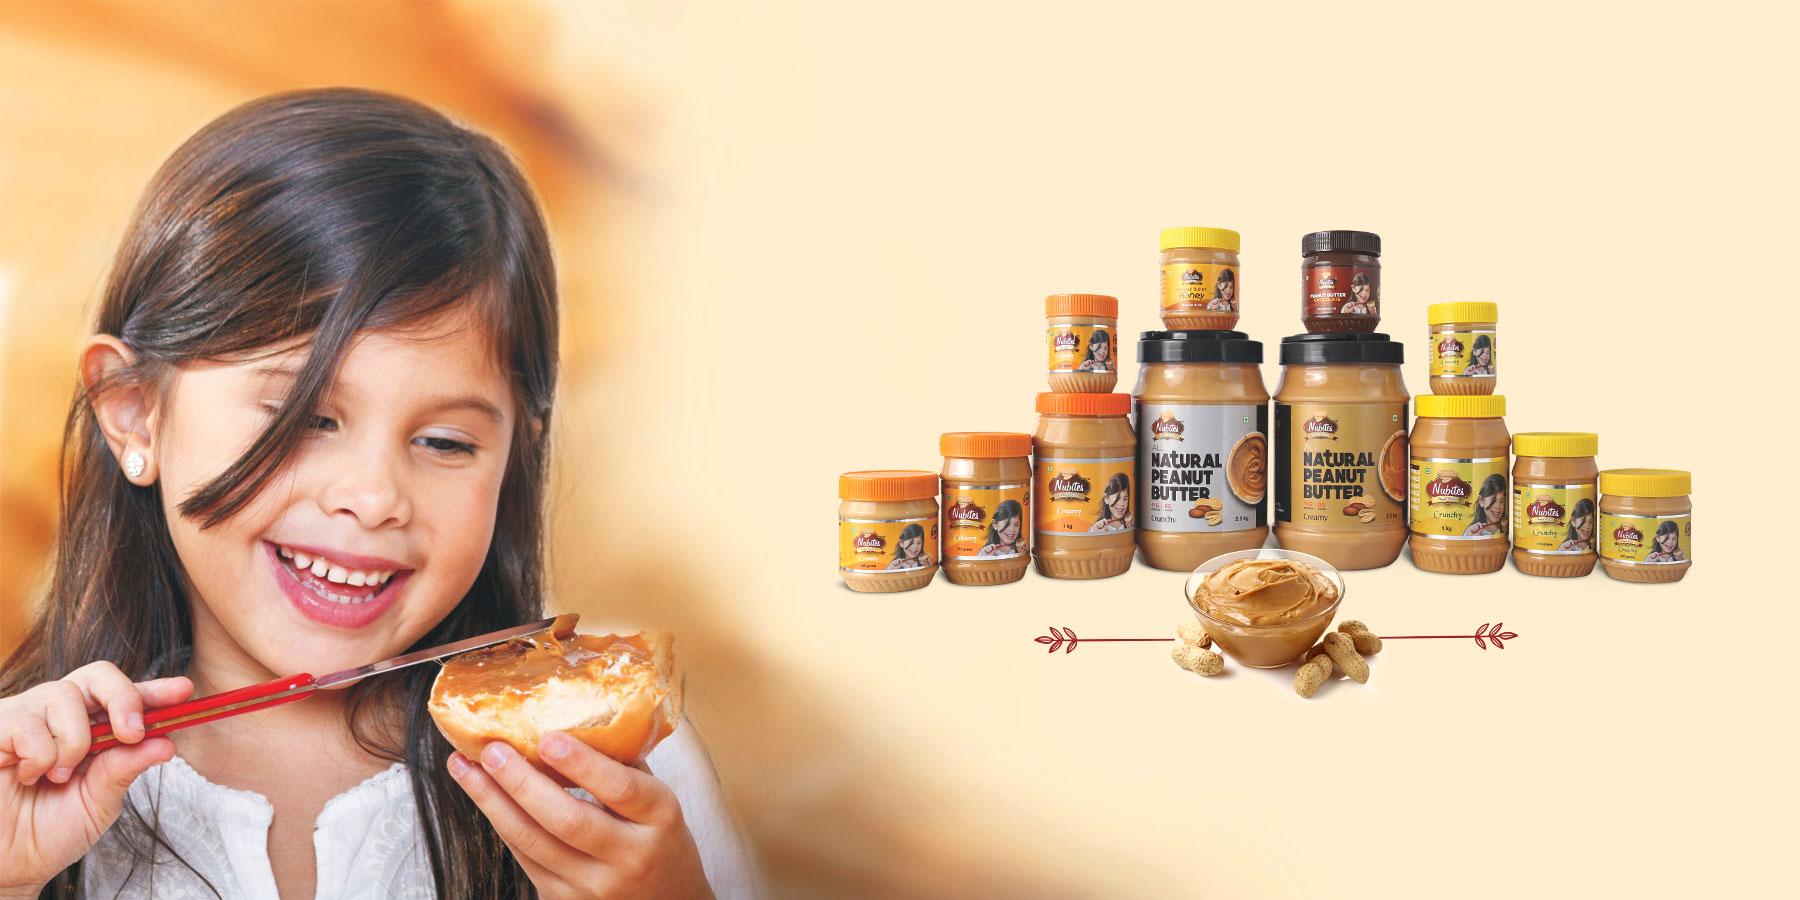 Nubites Peanut Butter